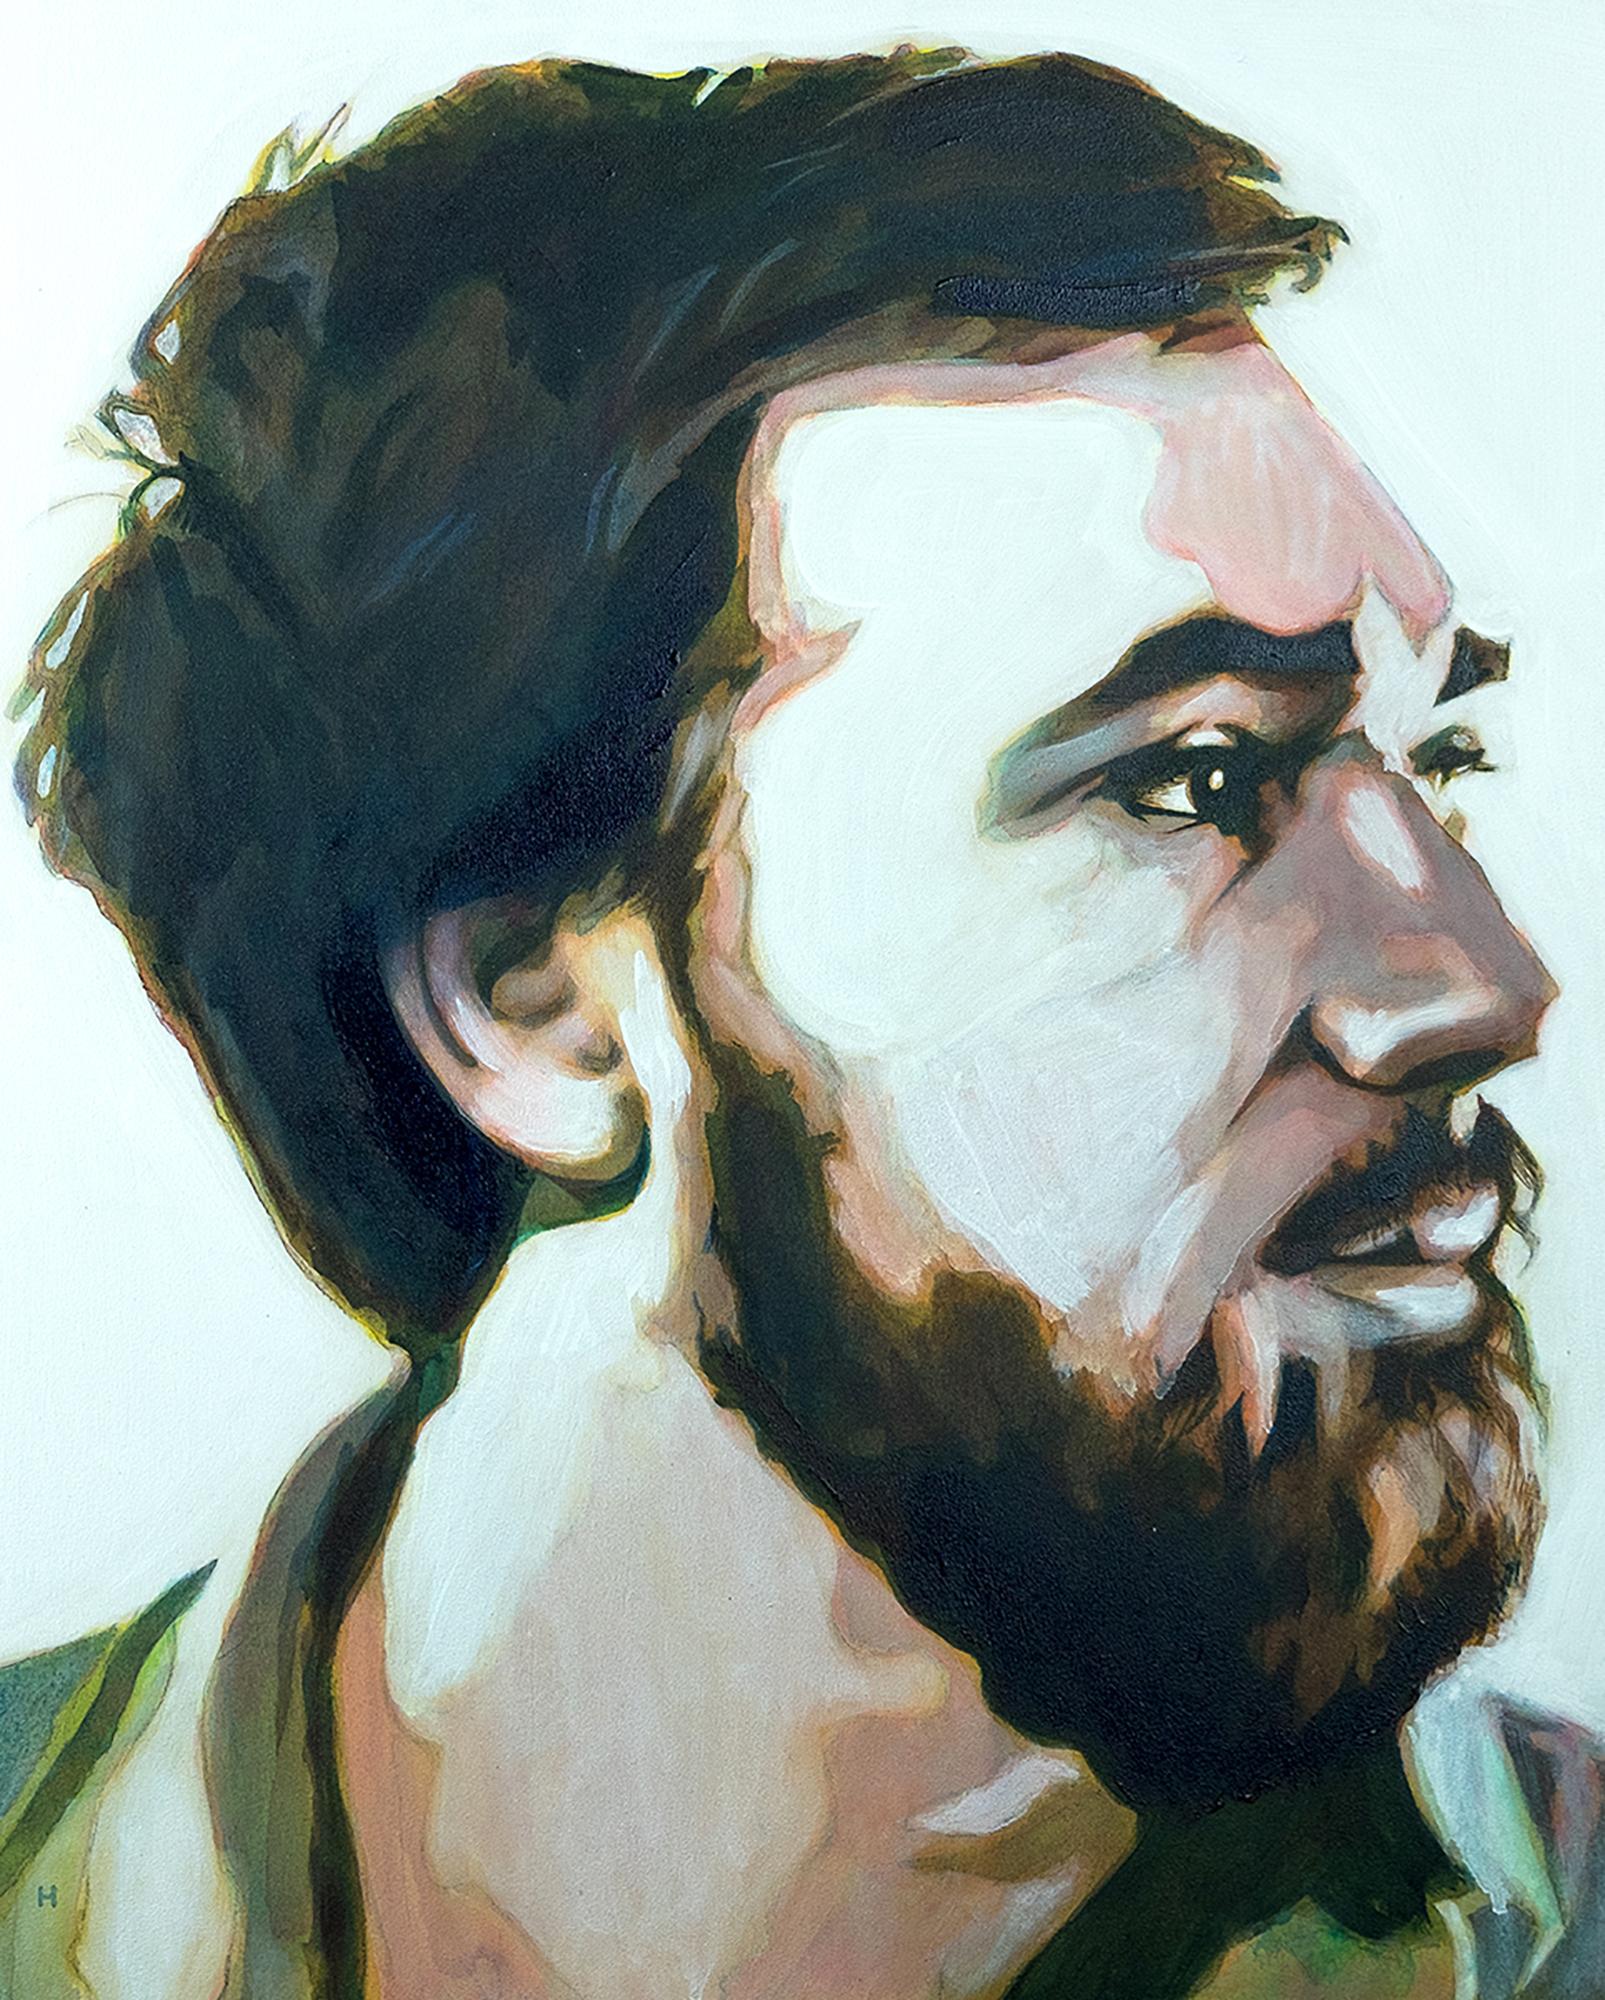 Chris Nickels, Illustrator